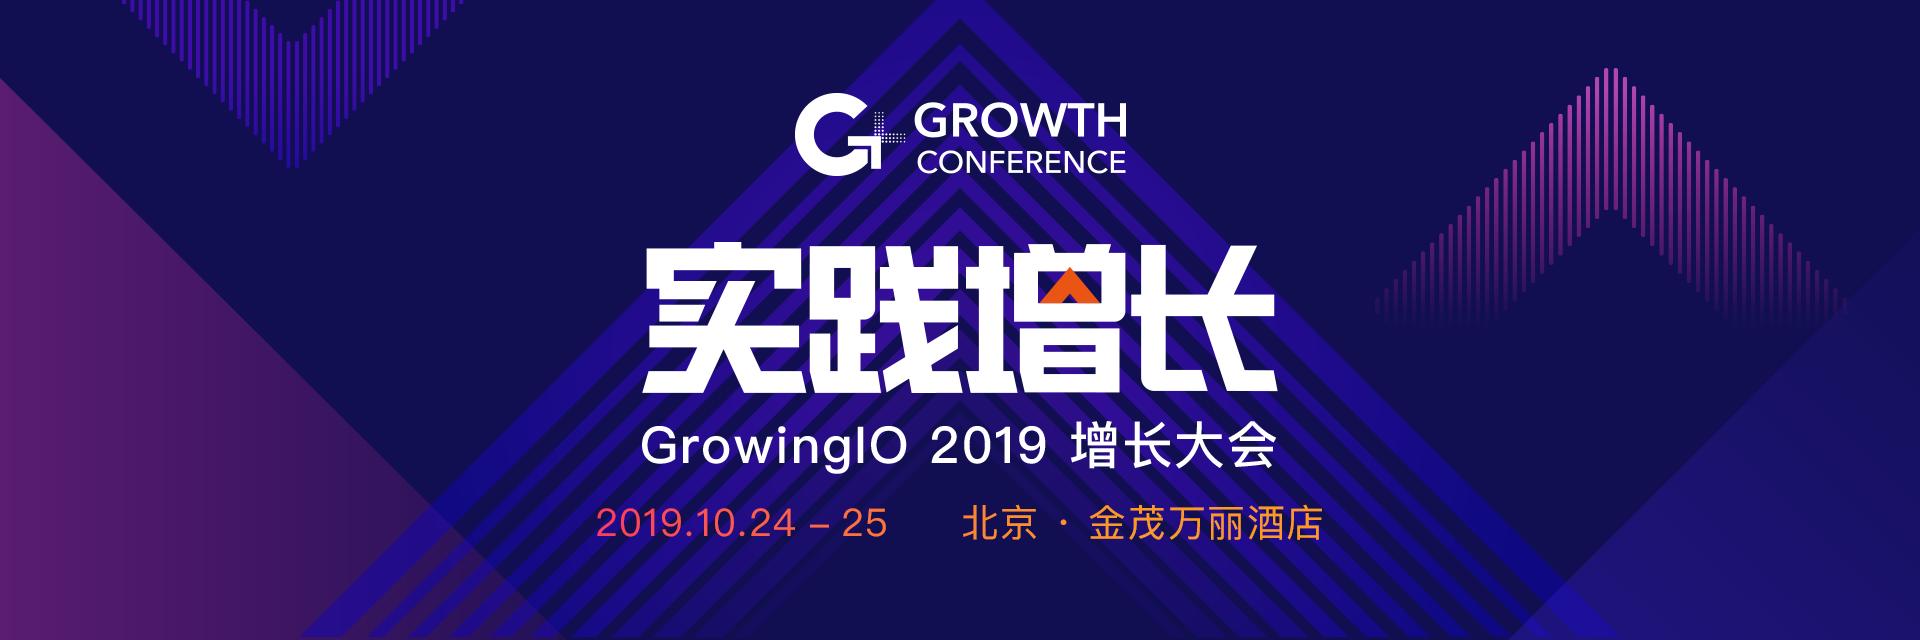 GrowingIO 2019 增长大会 - 实践增长